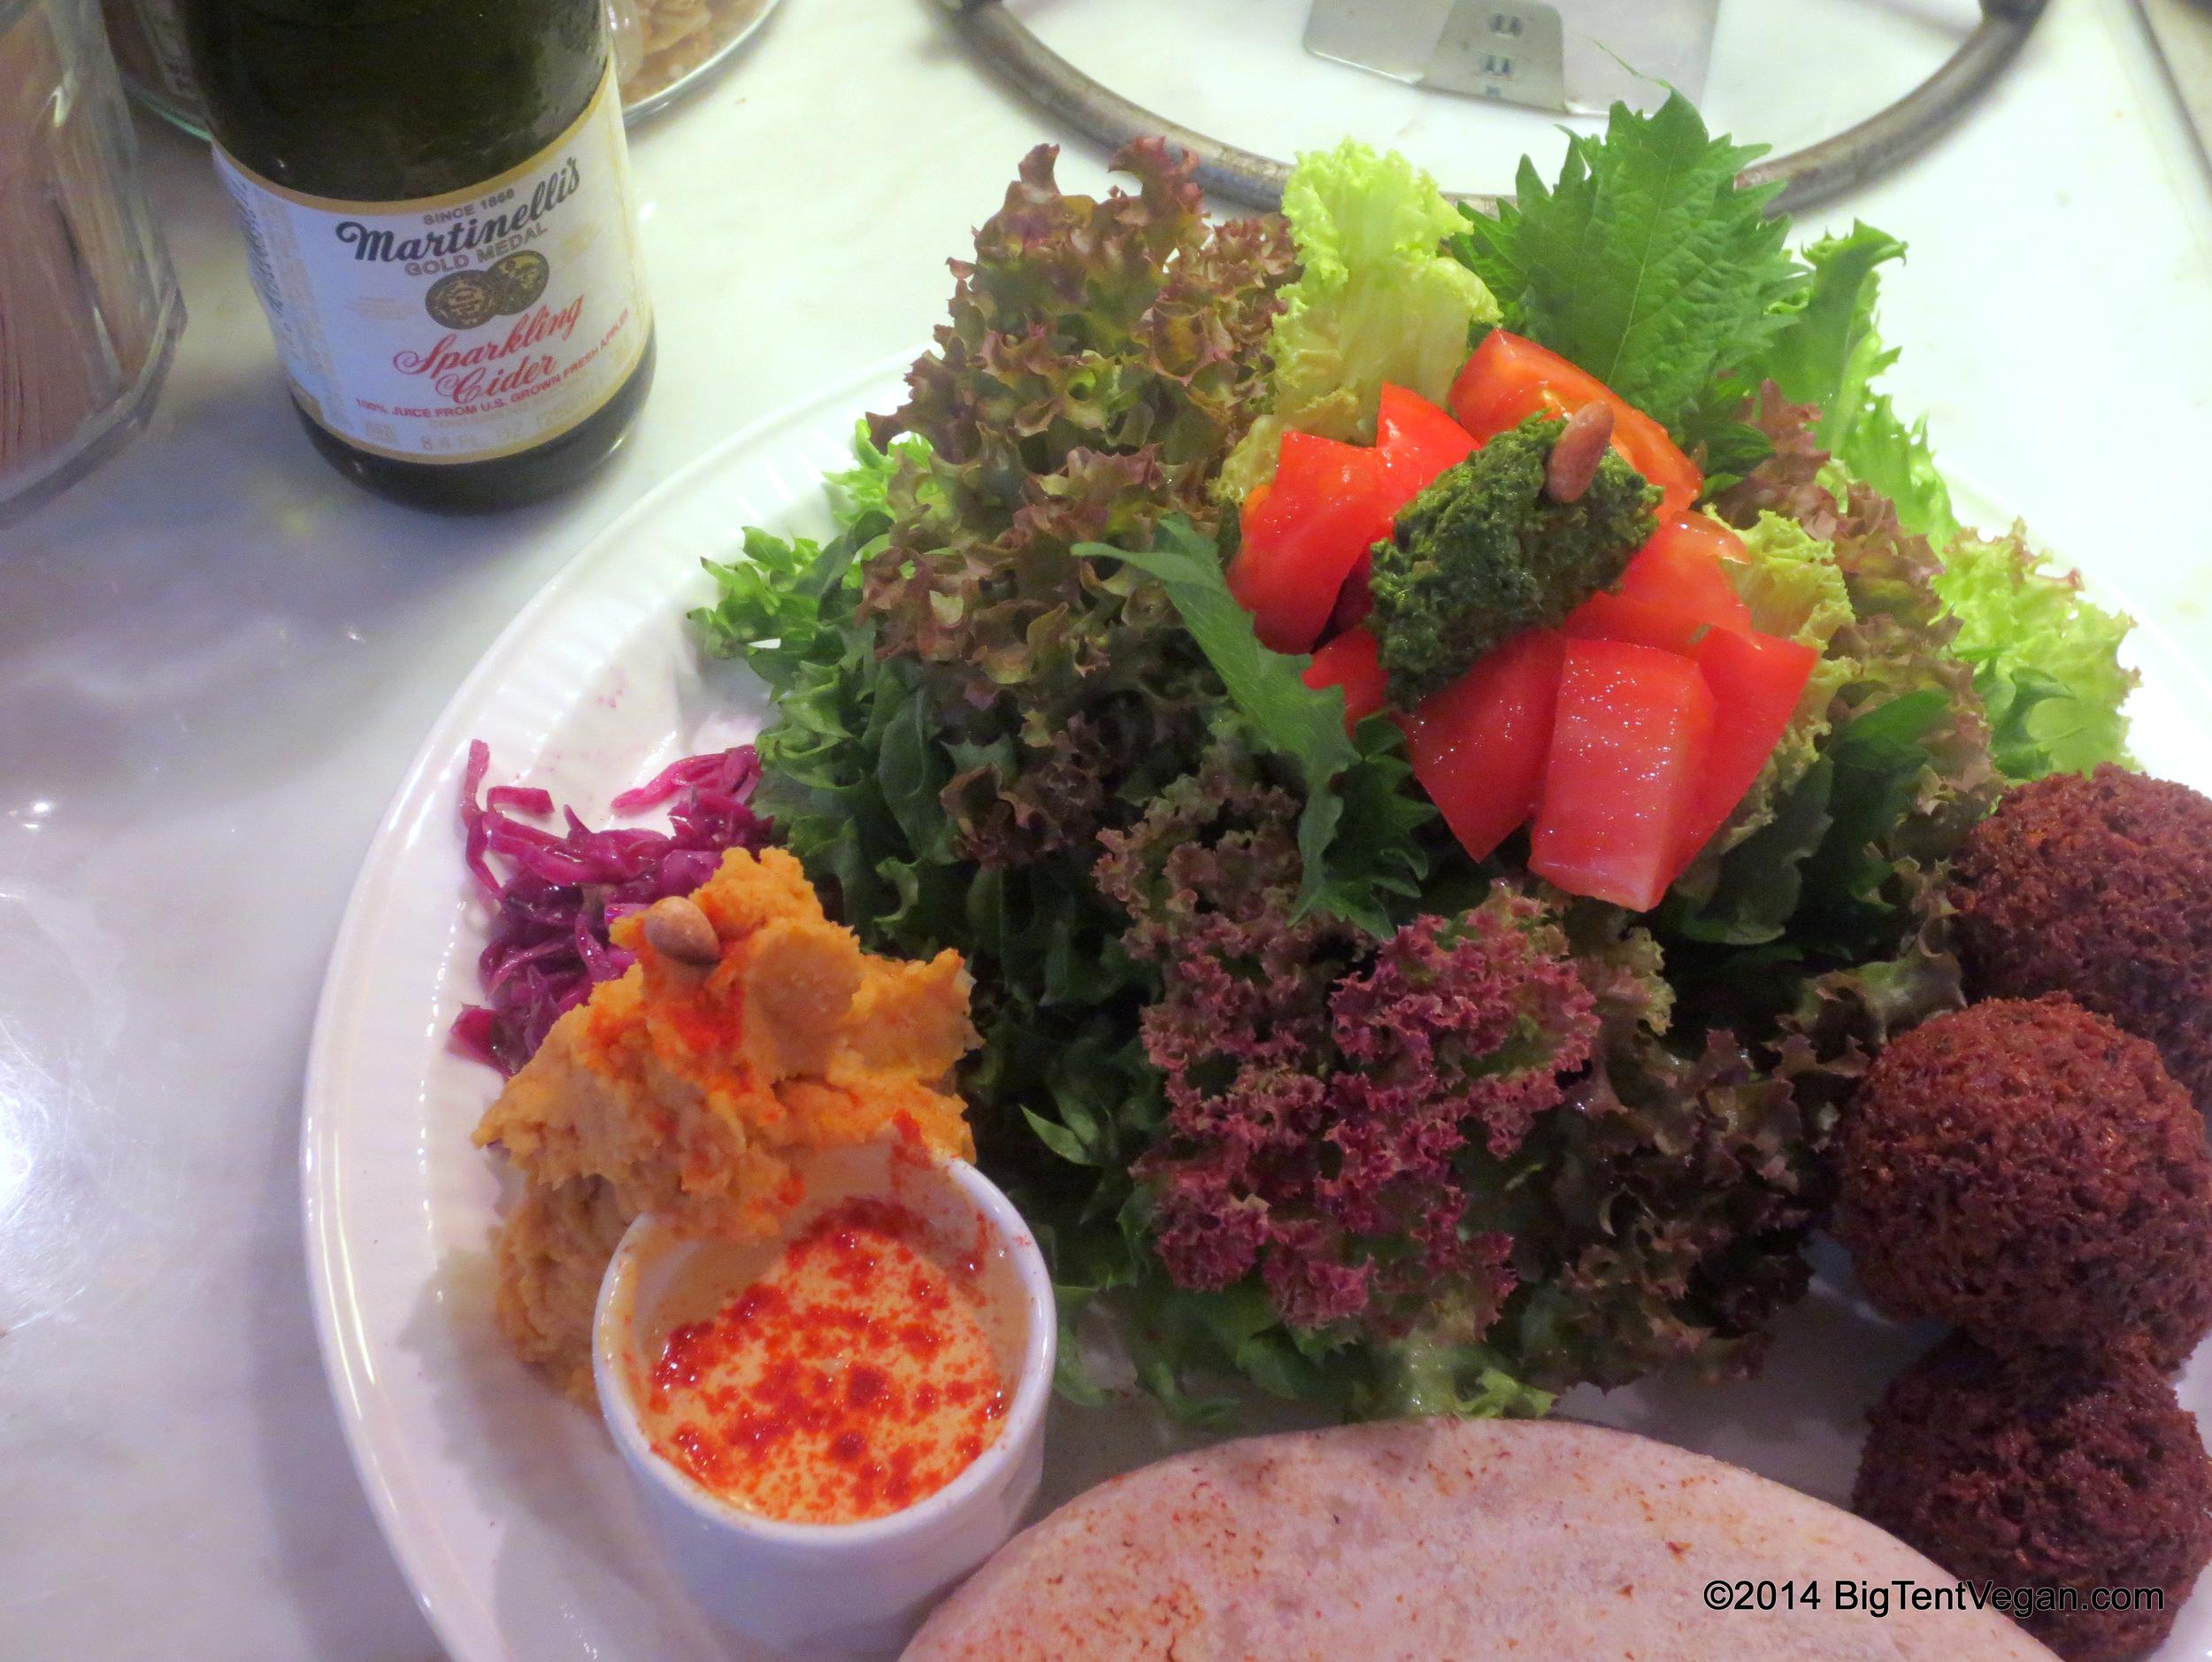 Falafel Plate at 100% vegan Kuumba du Falafel in Tokyo, Japan